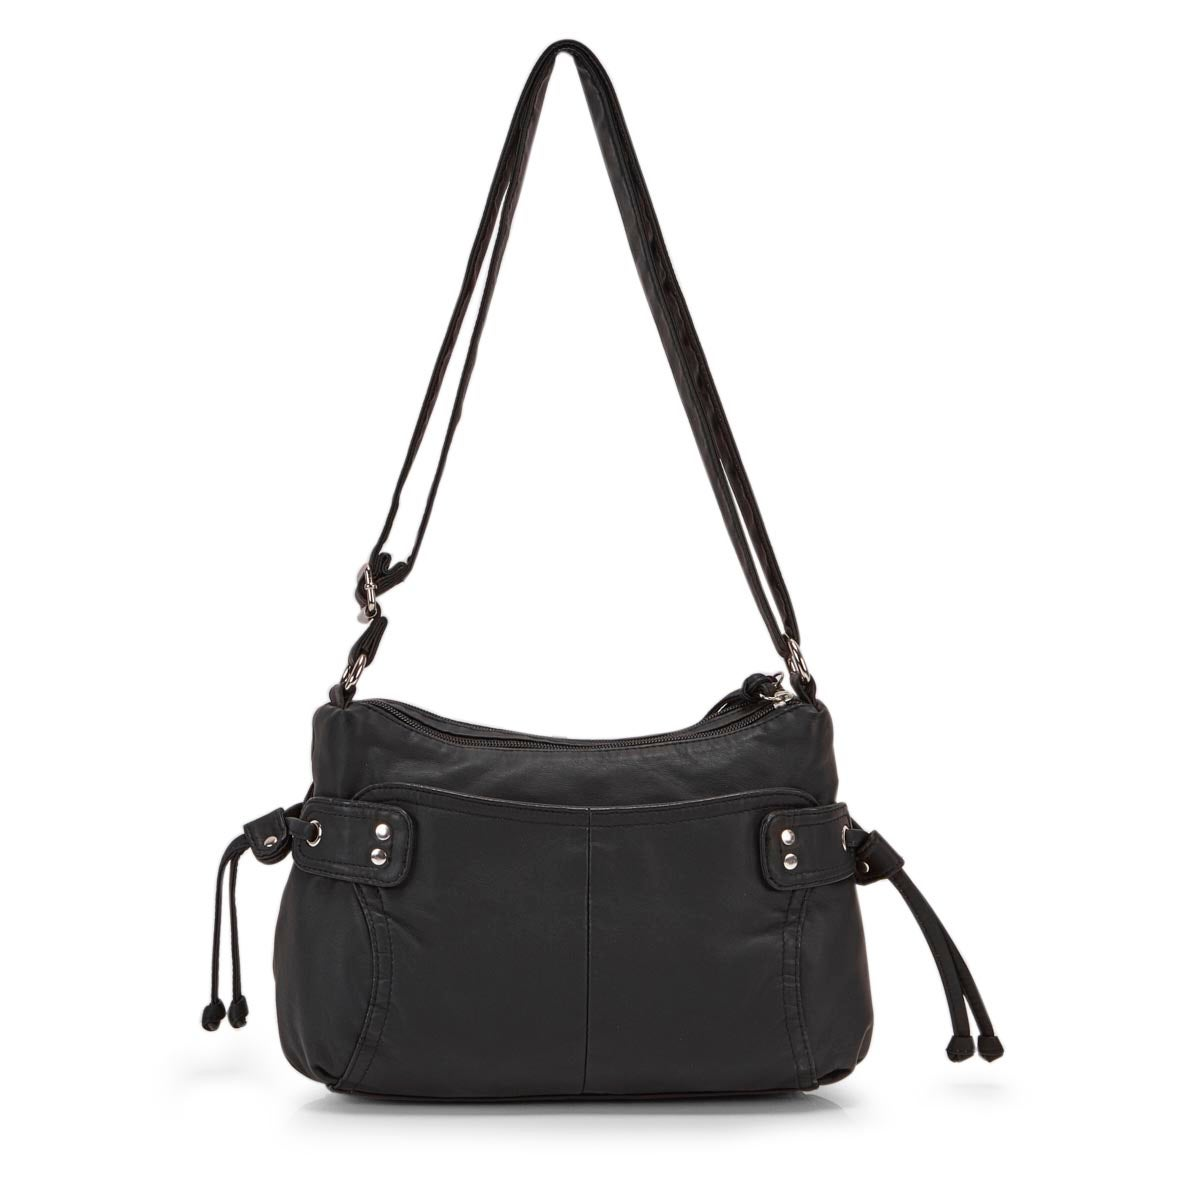 Lds black smooth crossbody bag